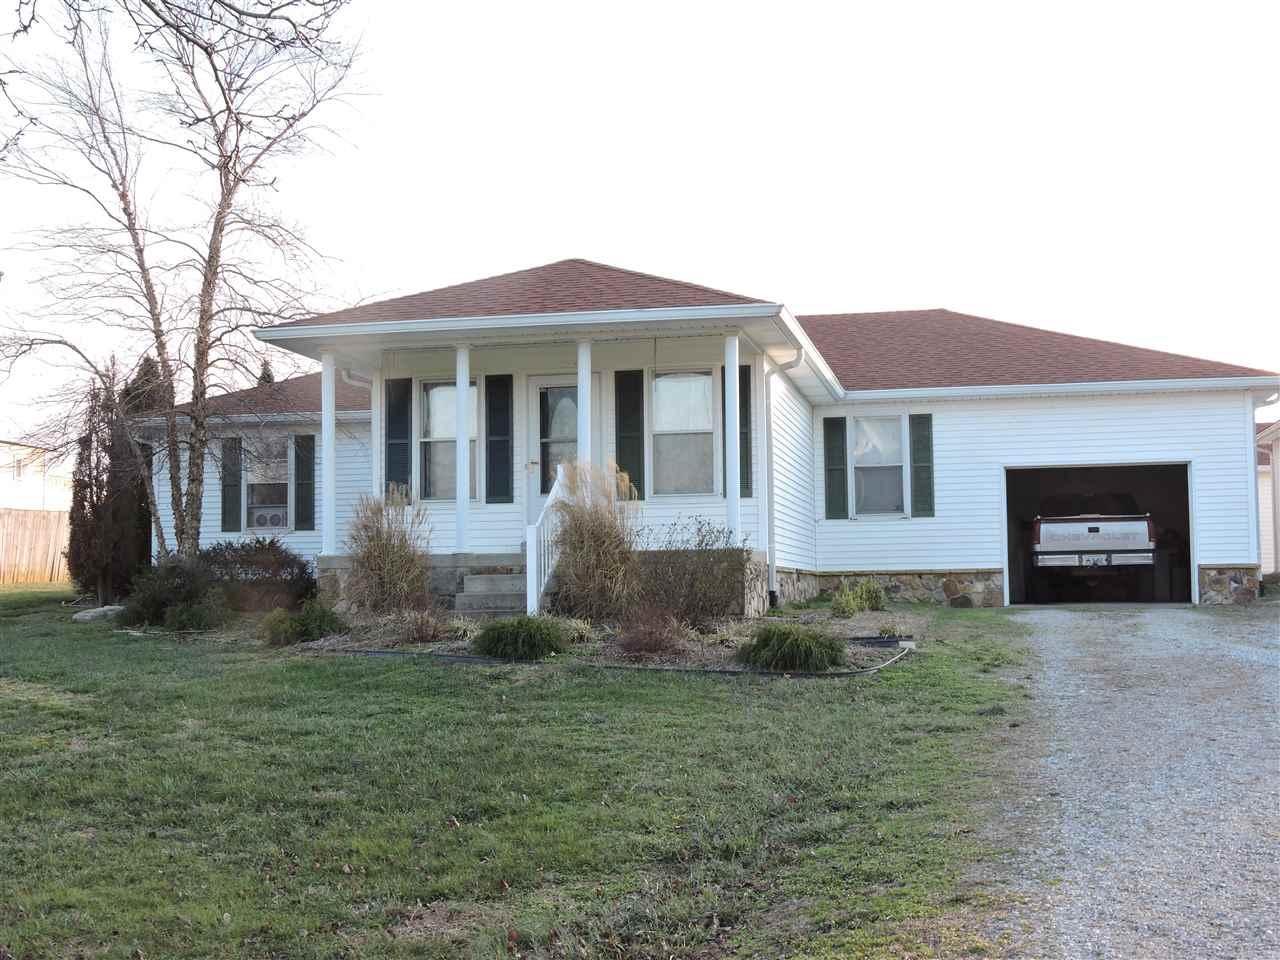 585 Mary Adams Rd, Franklin, KY 42134